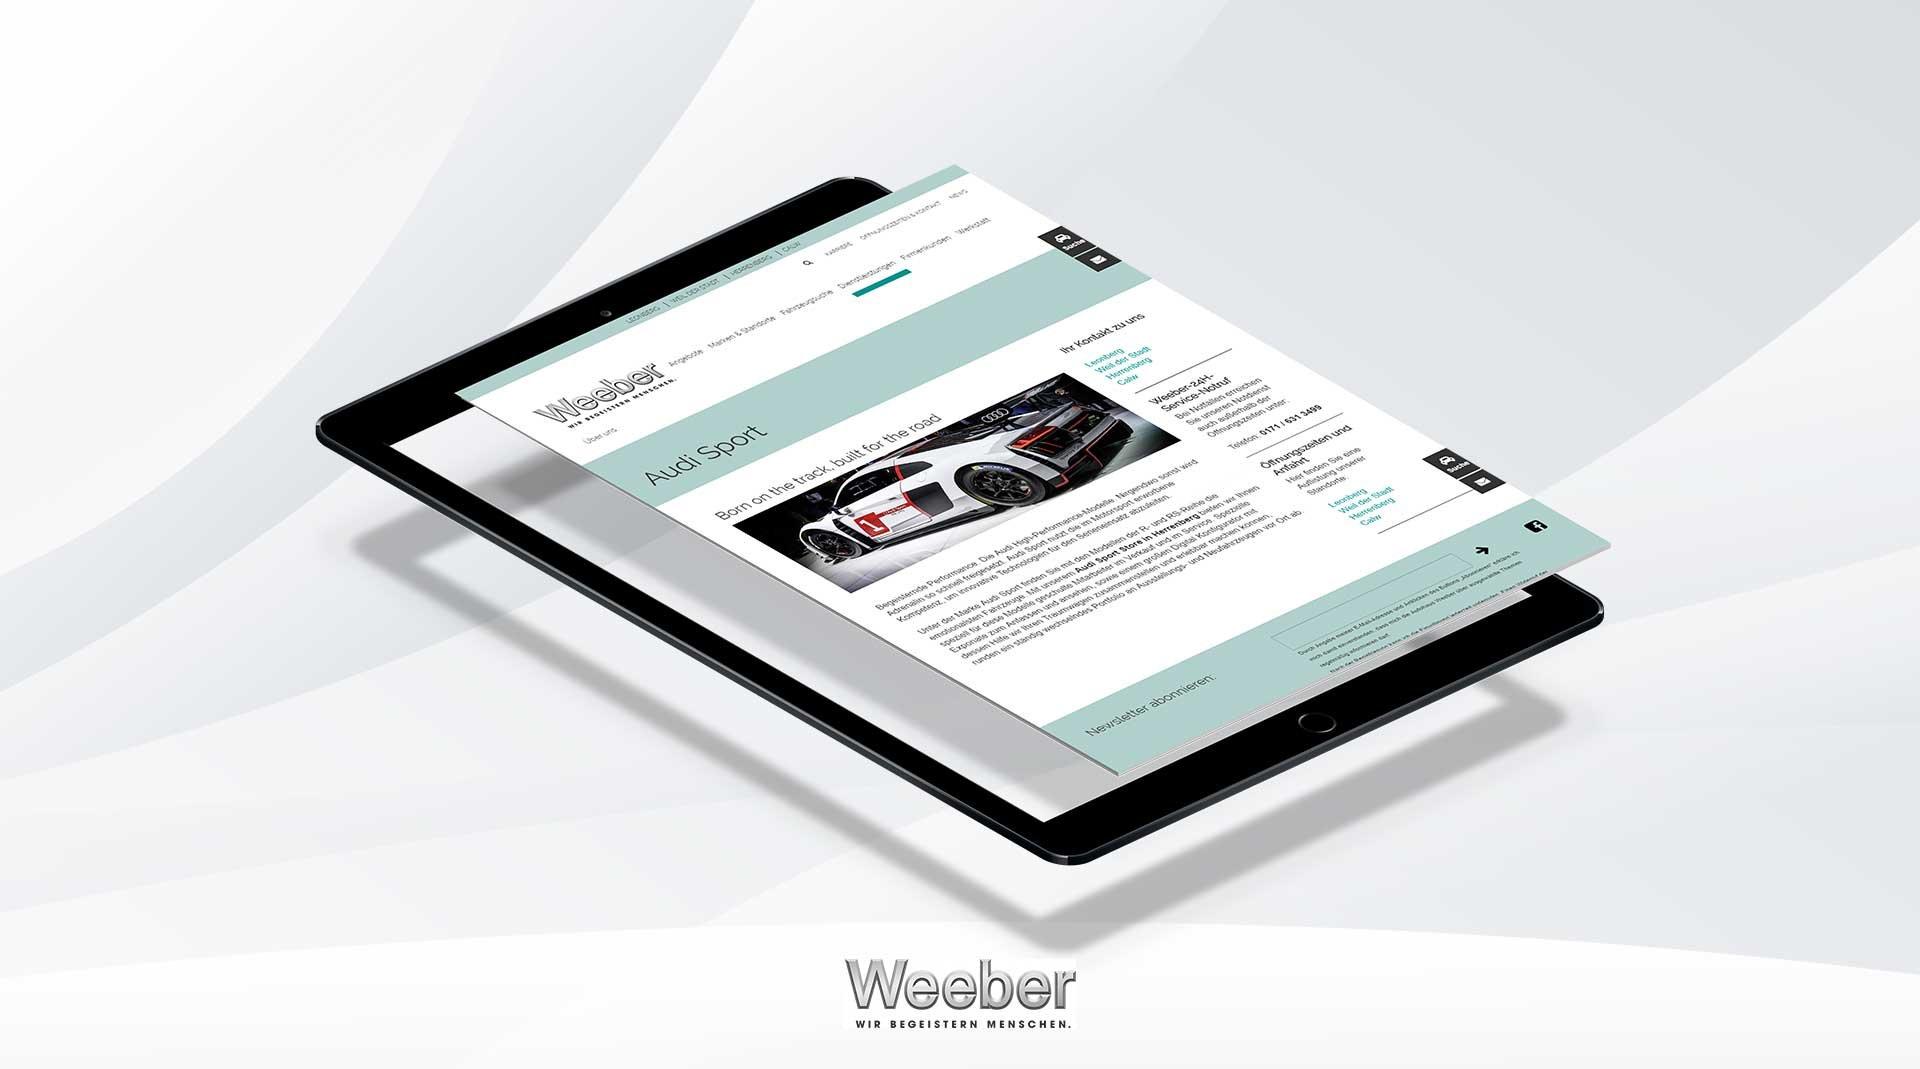 WEEBER-Relaunch-TYPO3